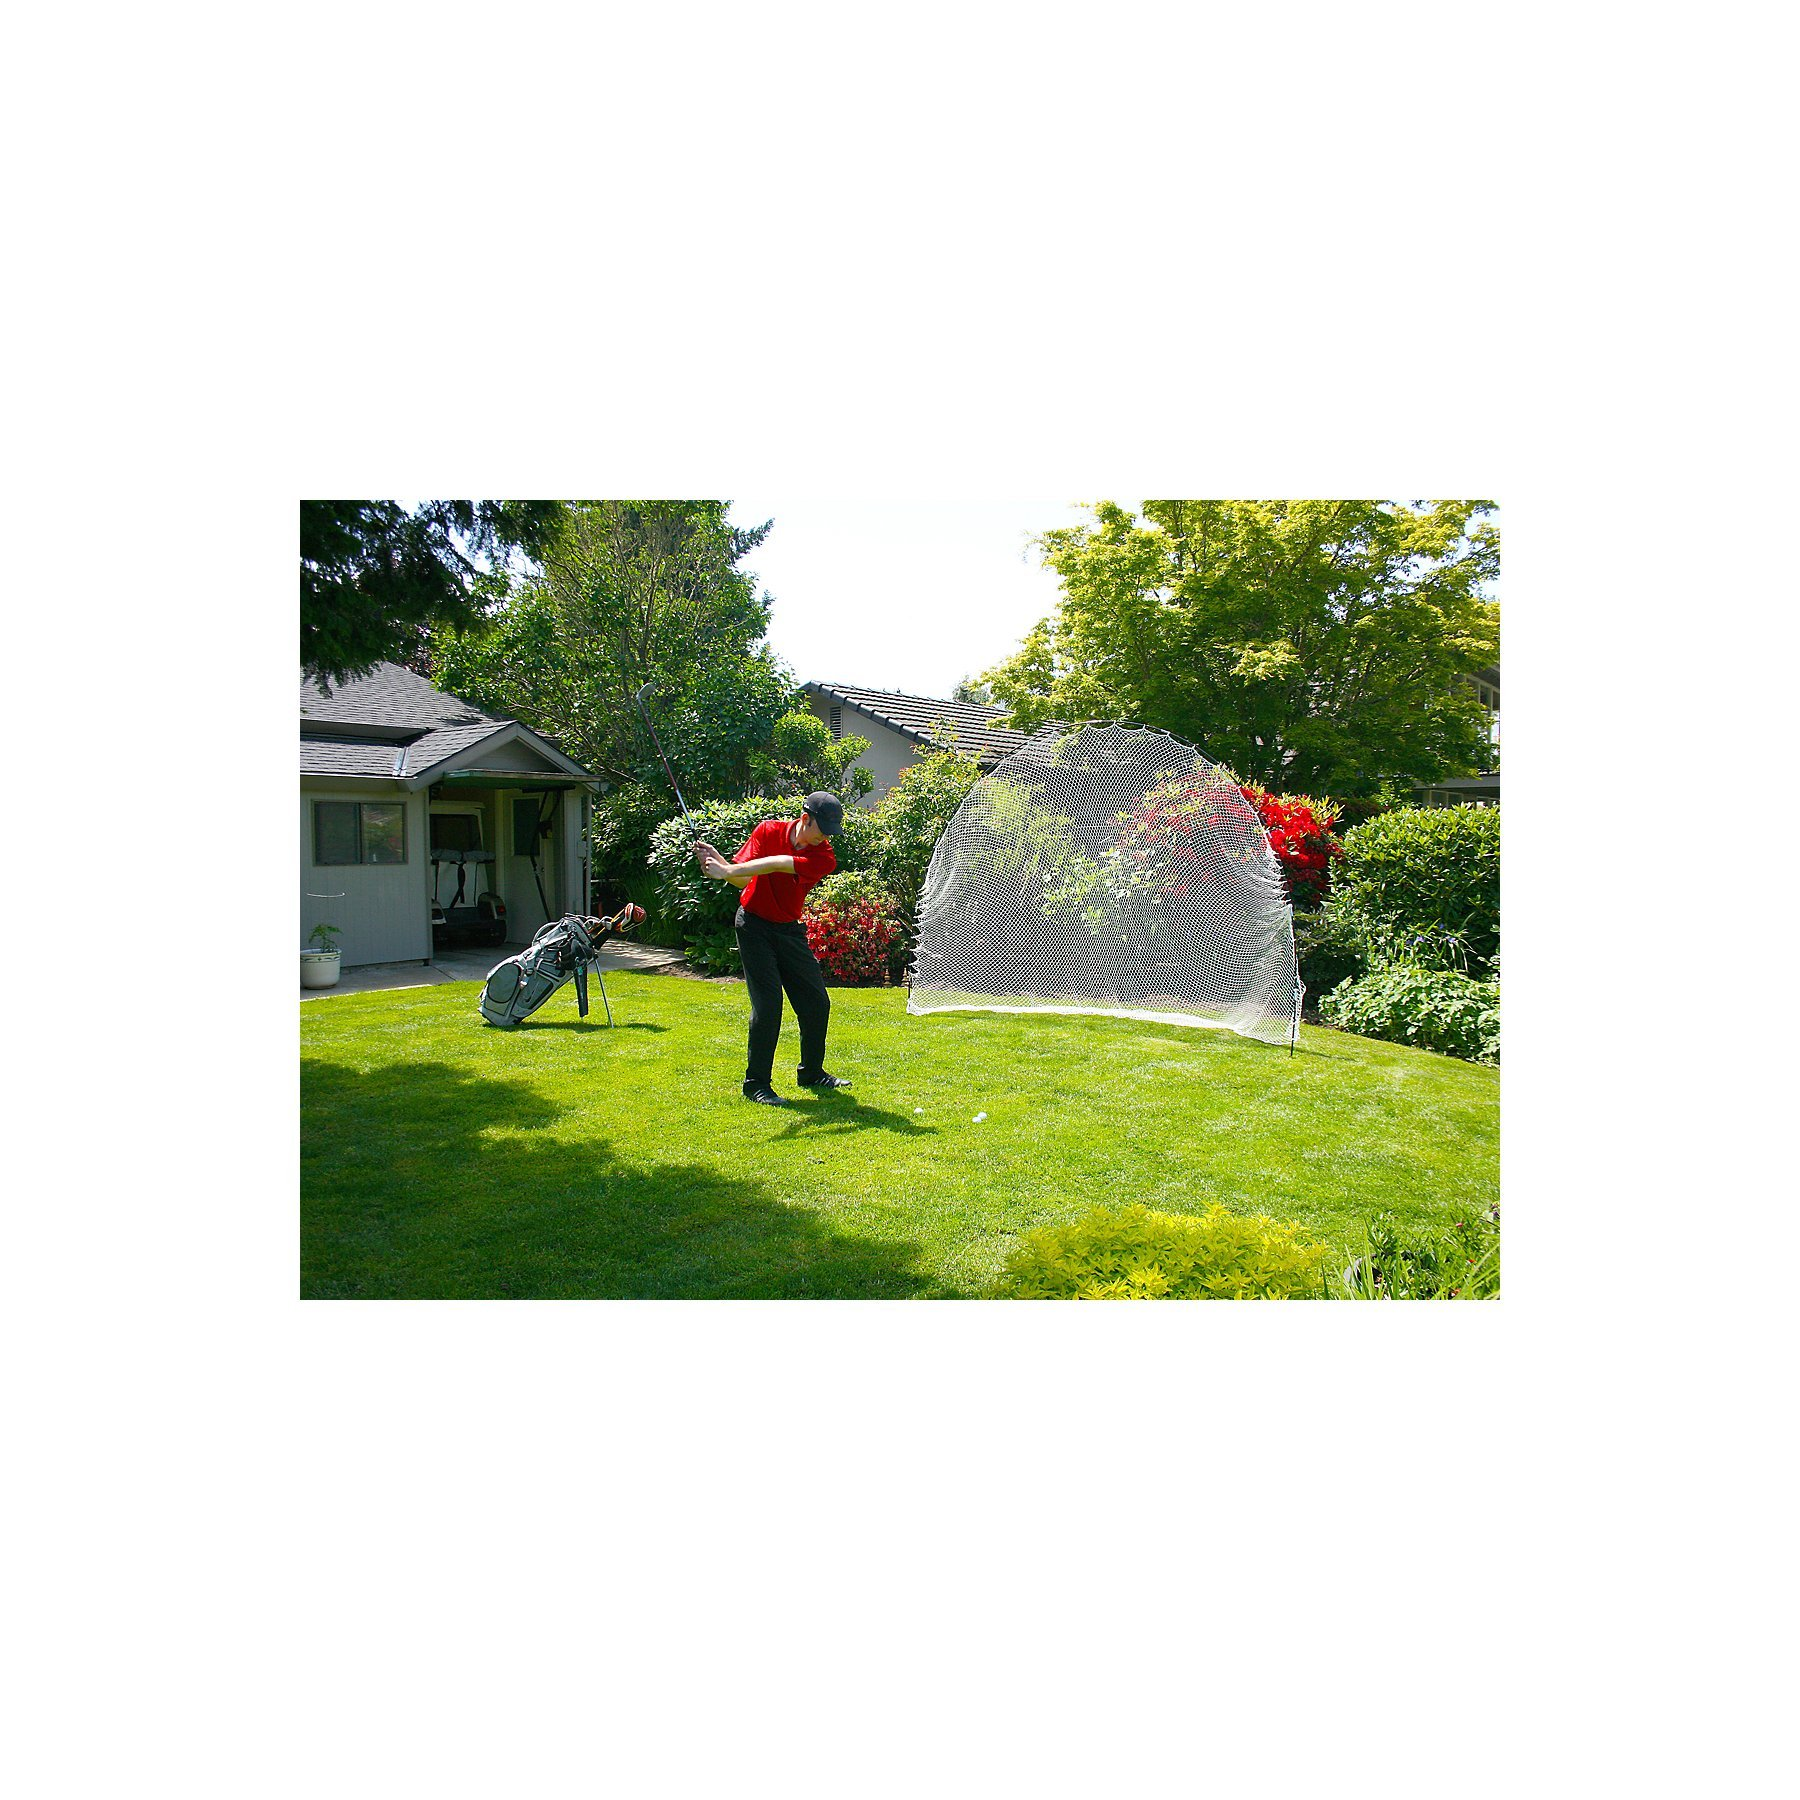 Go Net Backyard Golf Practice Hitting Net by ProActive Sports (Image #2)